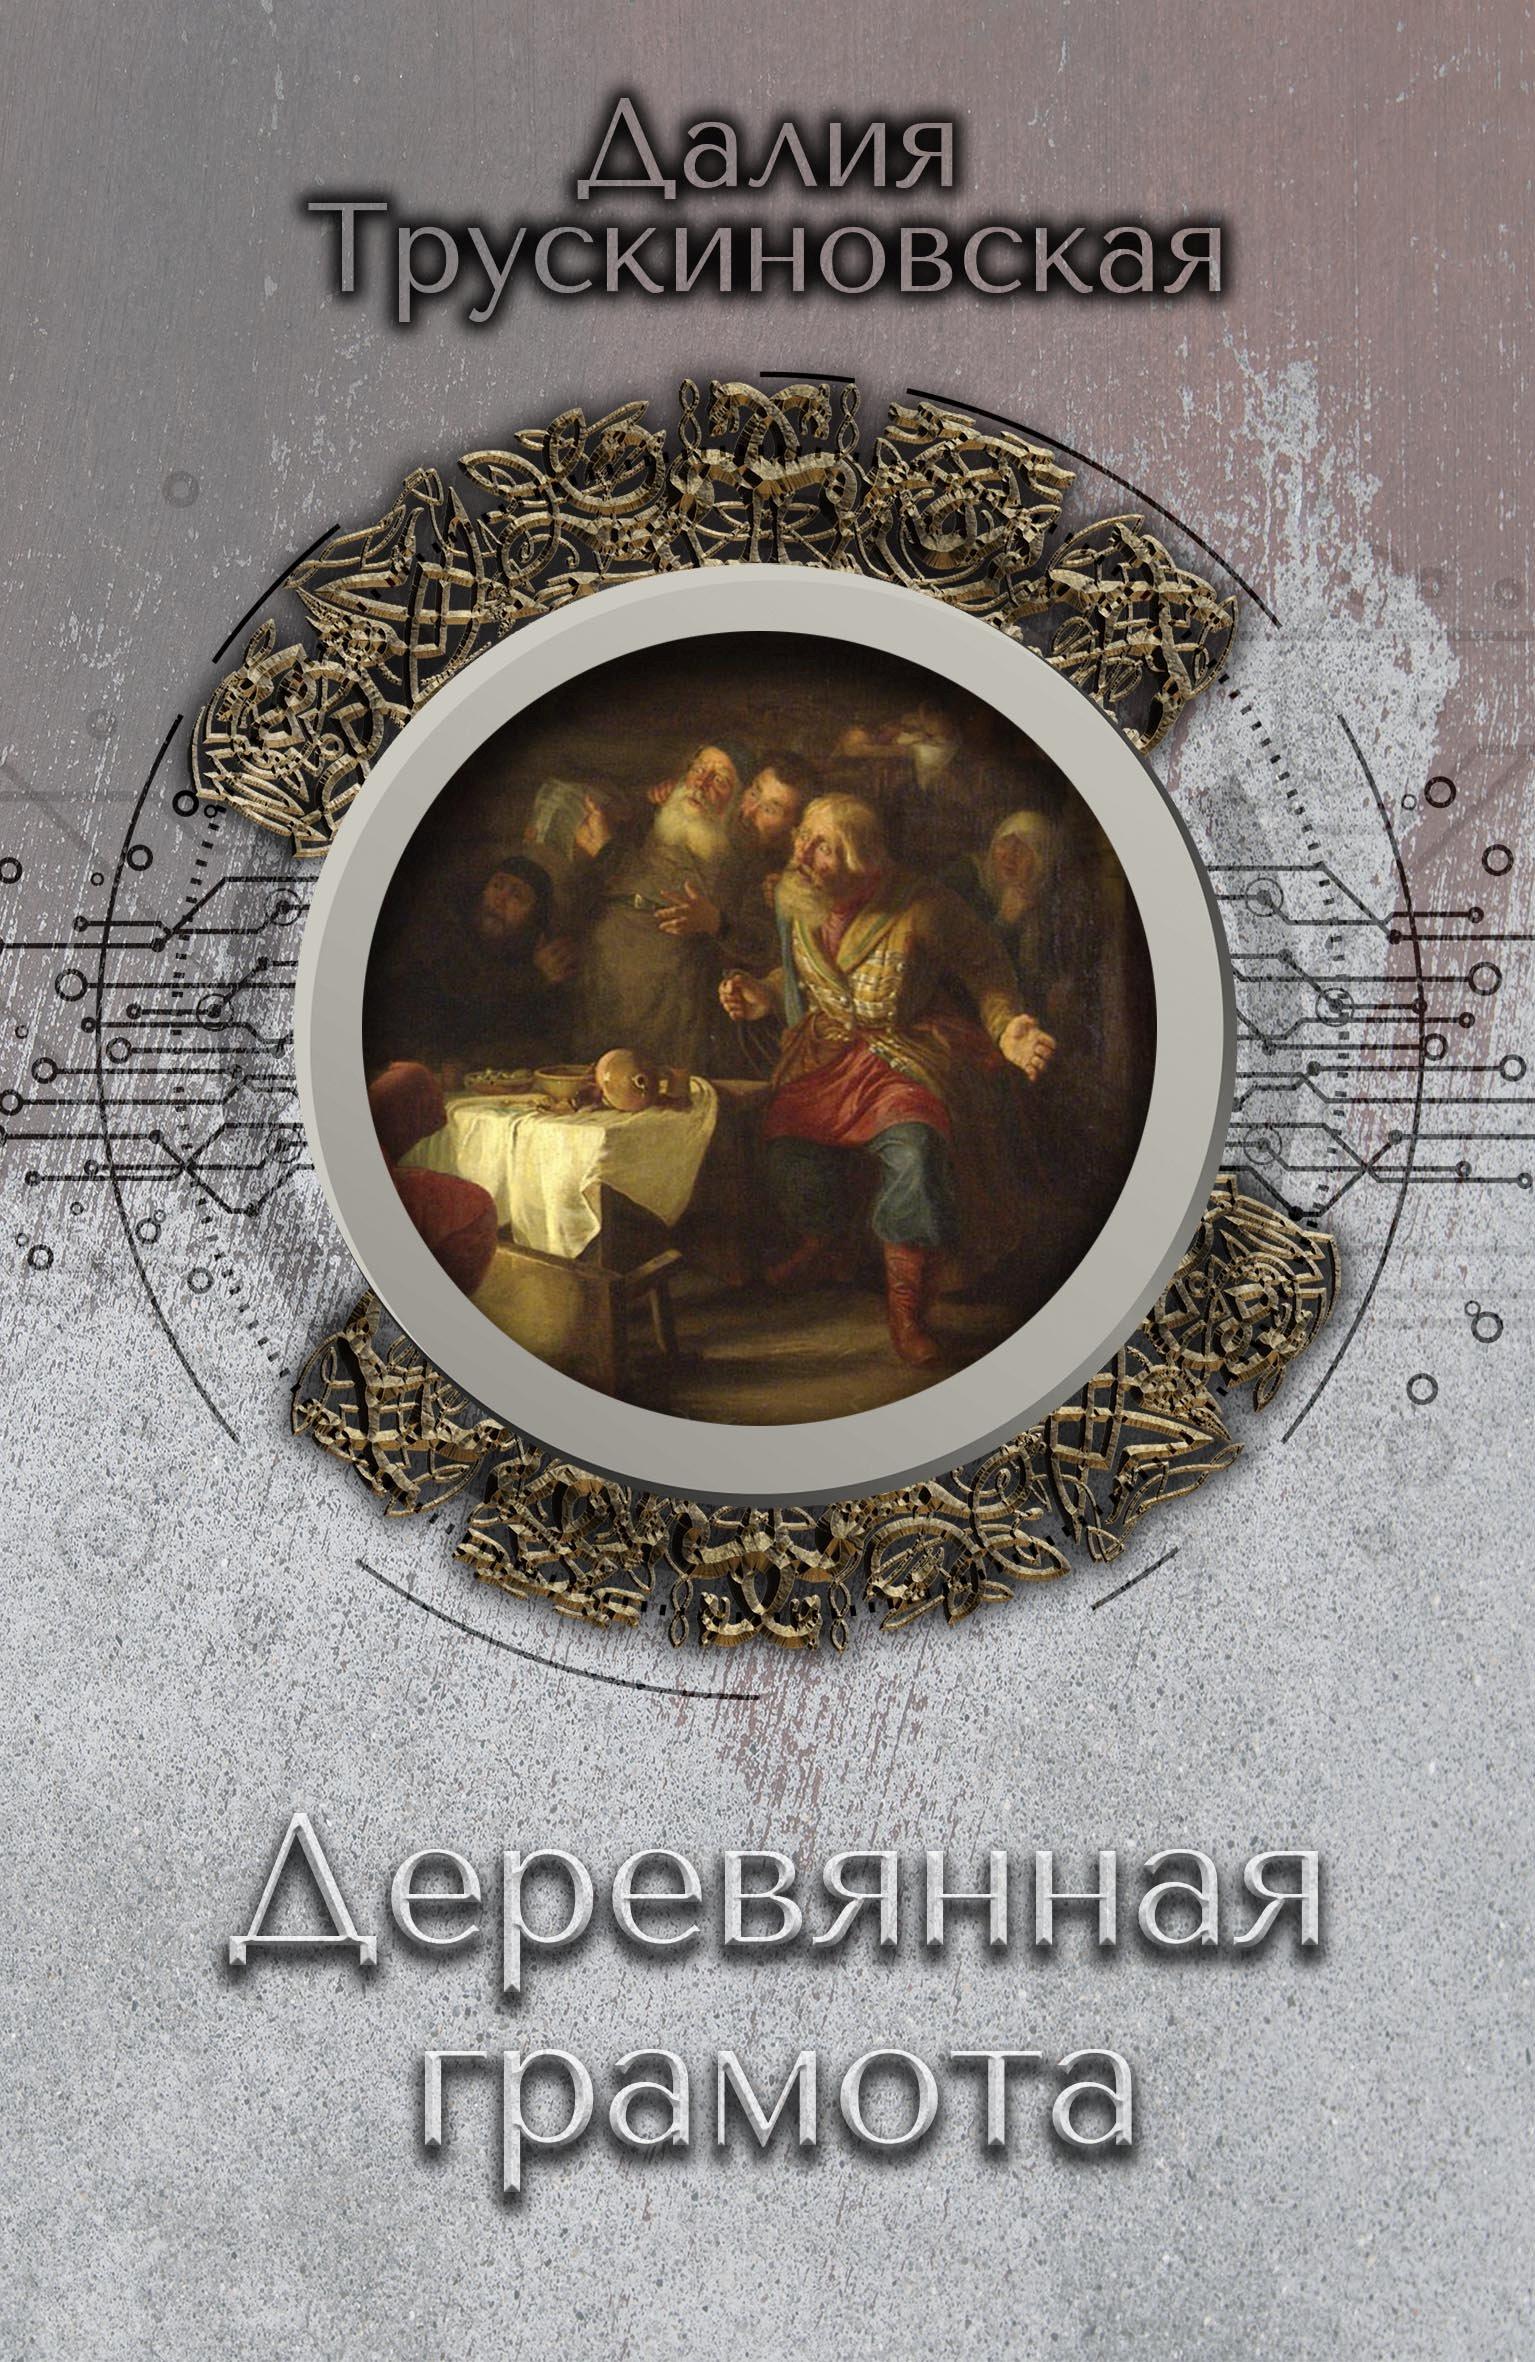 derevyannaya gramota